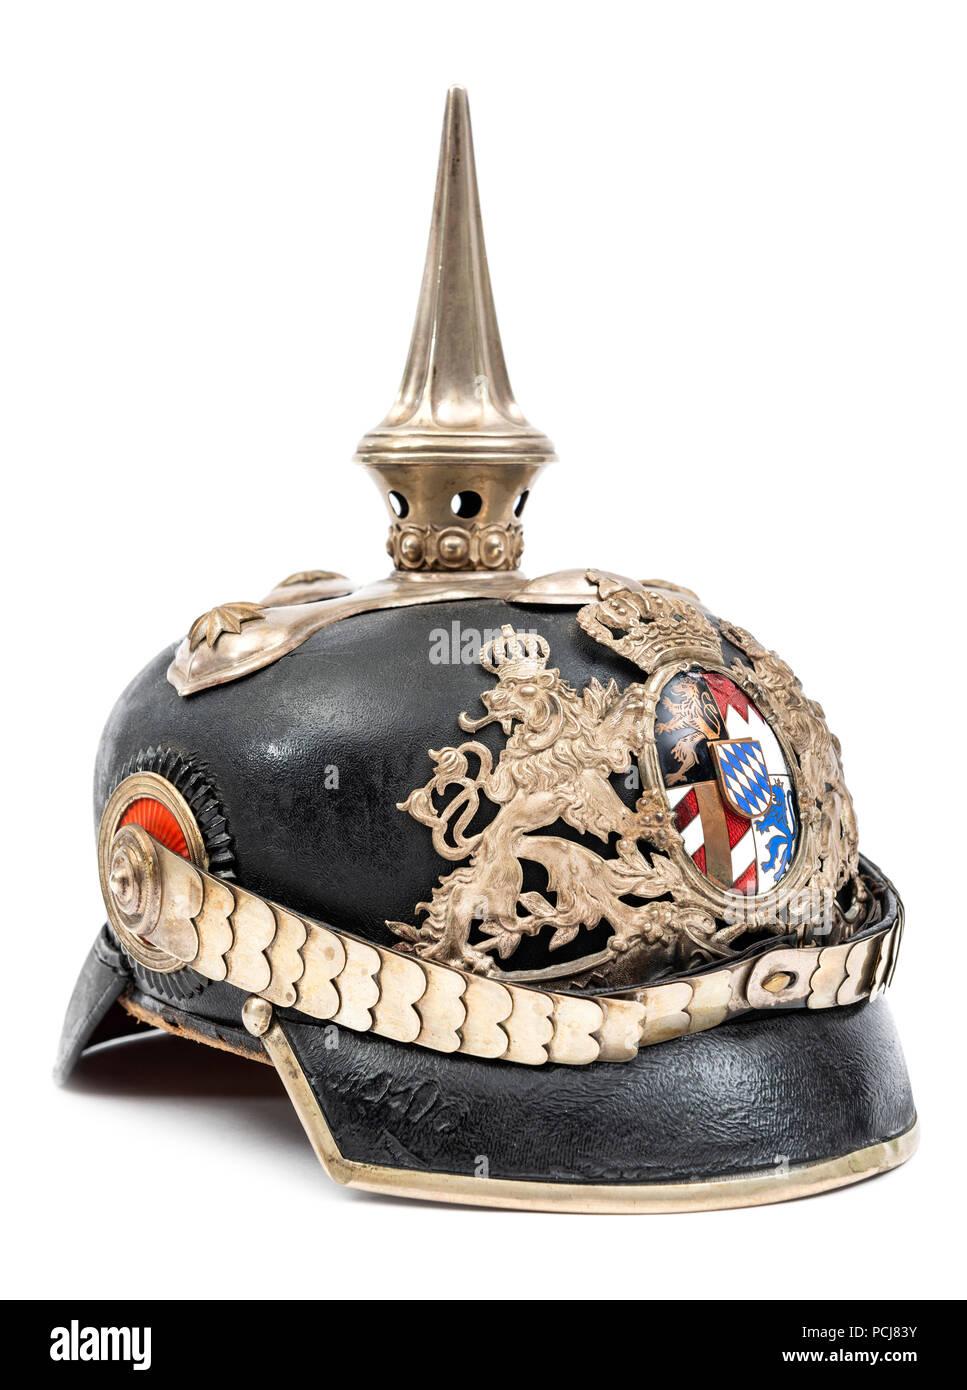 German Pickelhaube Helmet - Stock Image